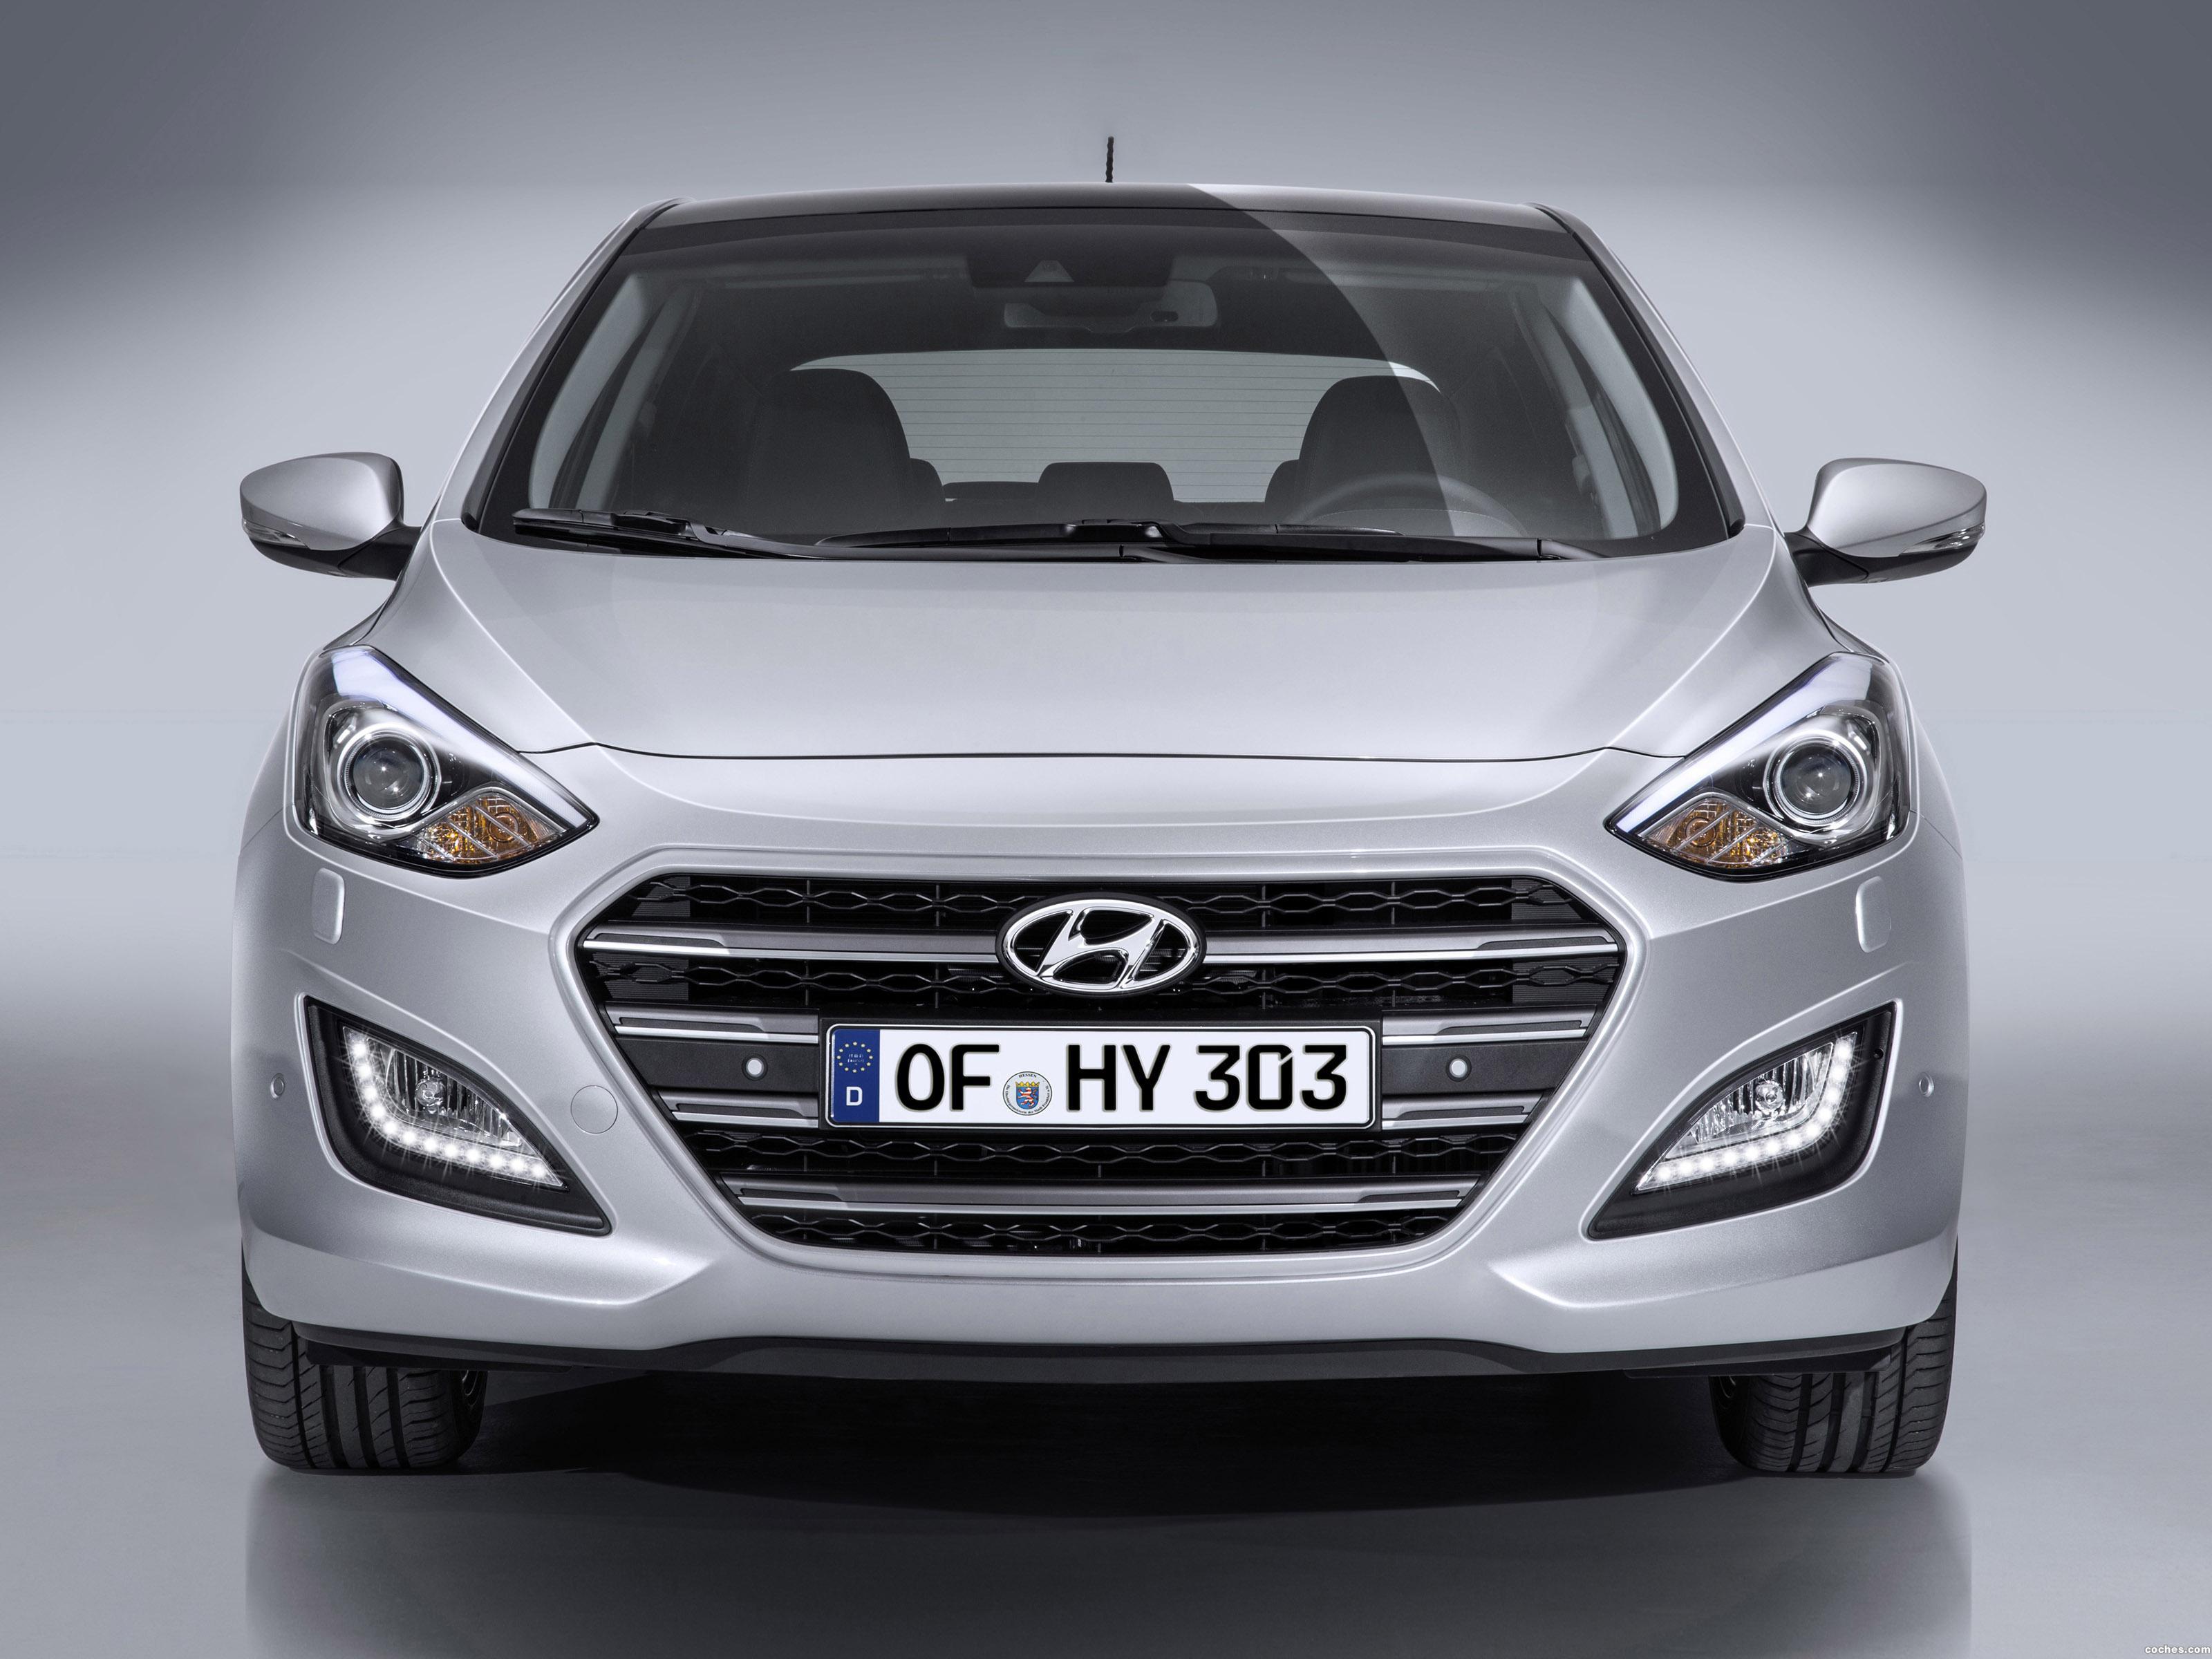 Foto 0 de Hyundai i30 5 puertas 2015